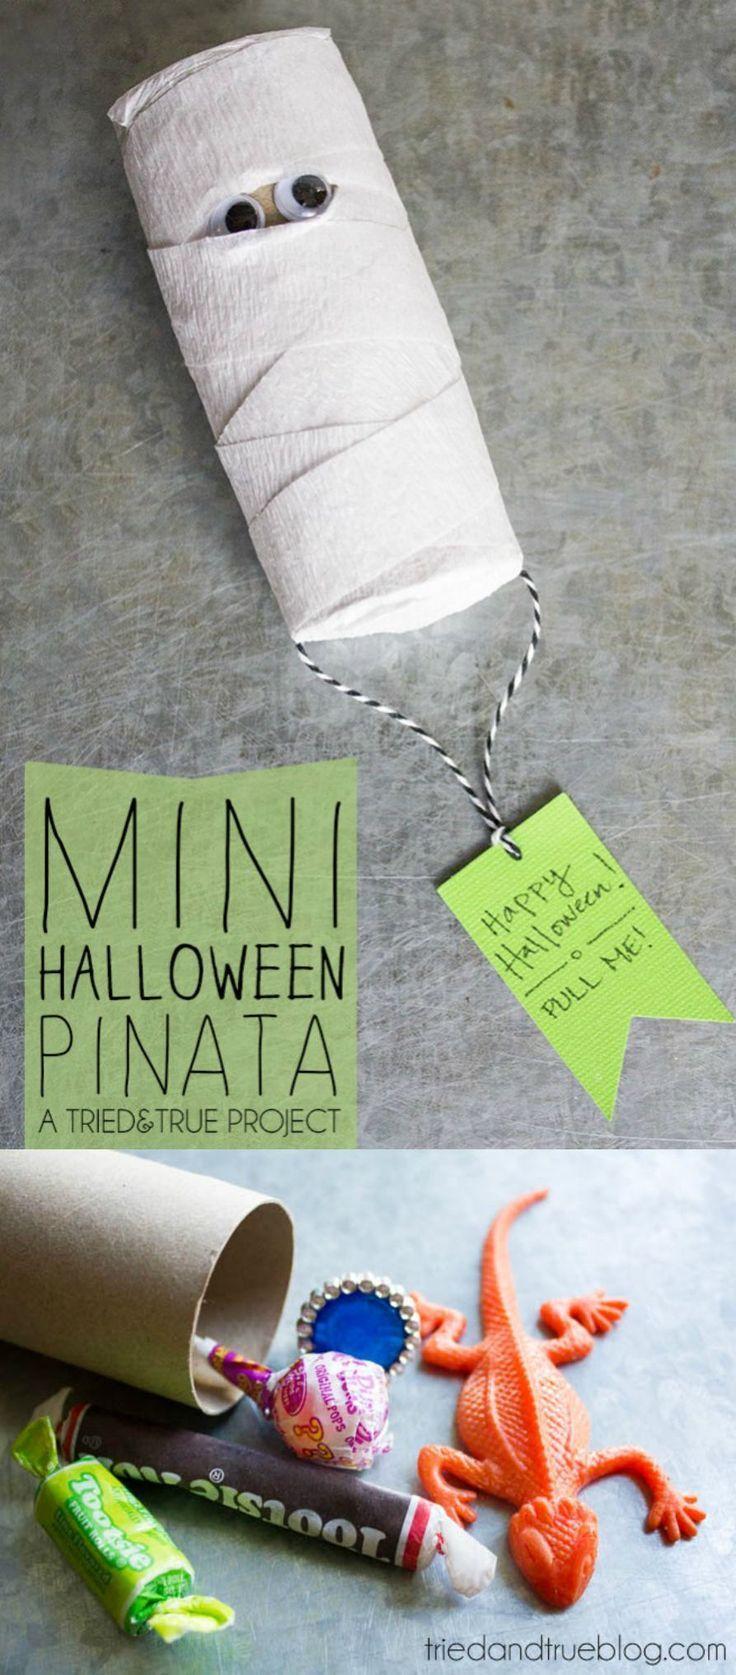 Inside clipart kids halloween 25+  Pinterest on Kids